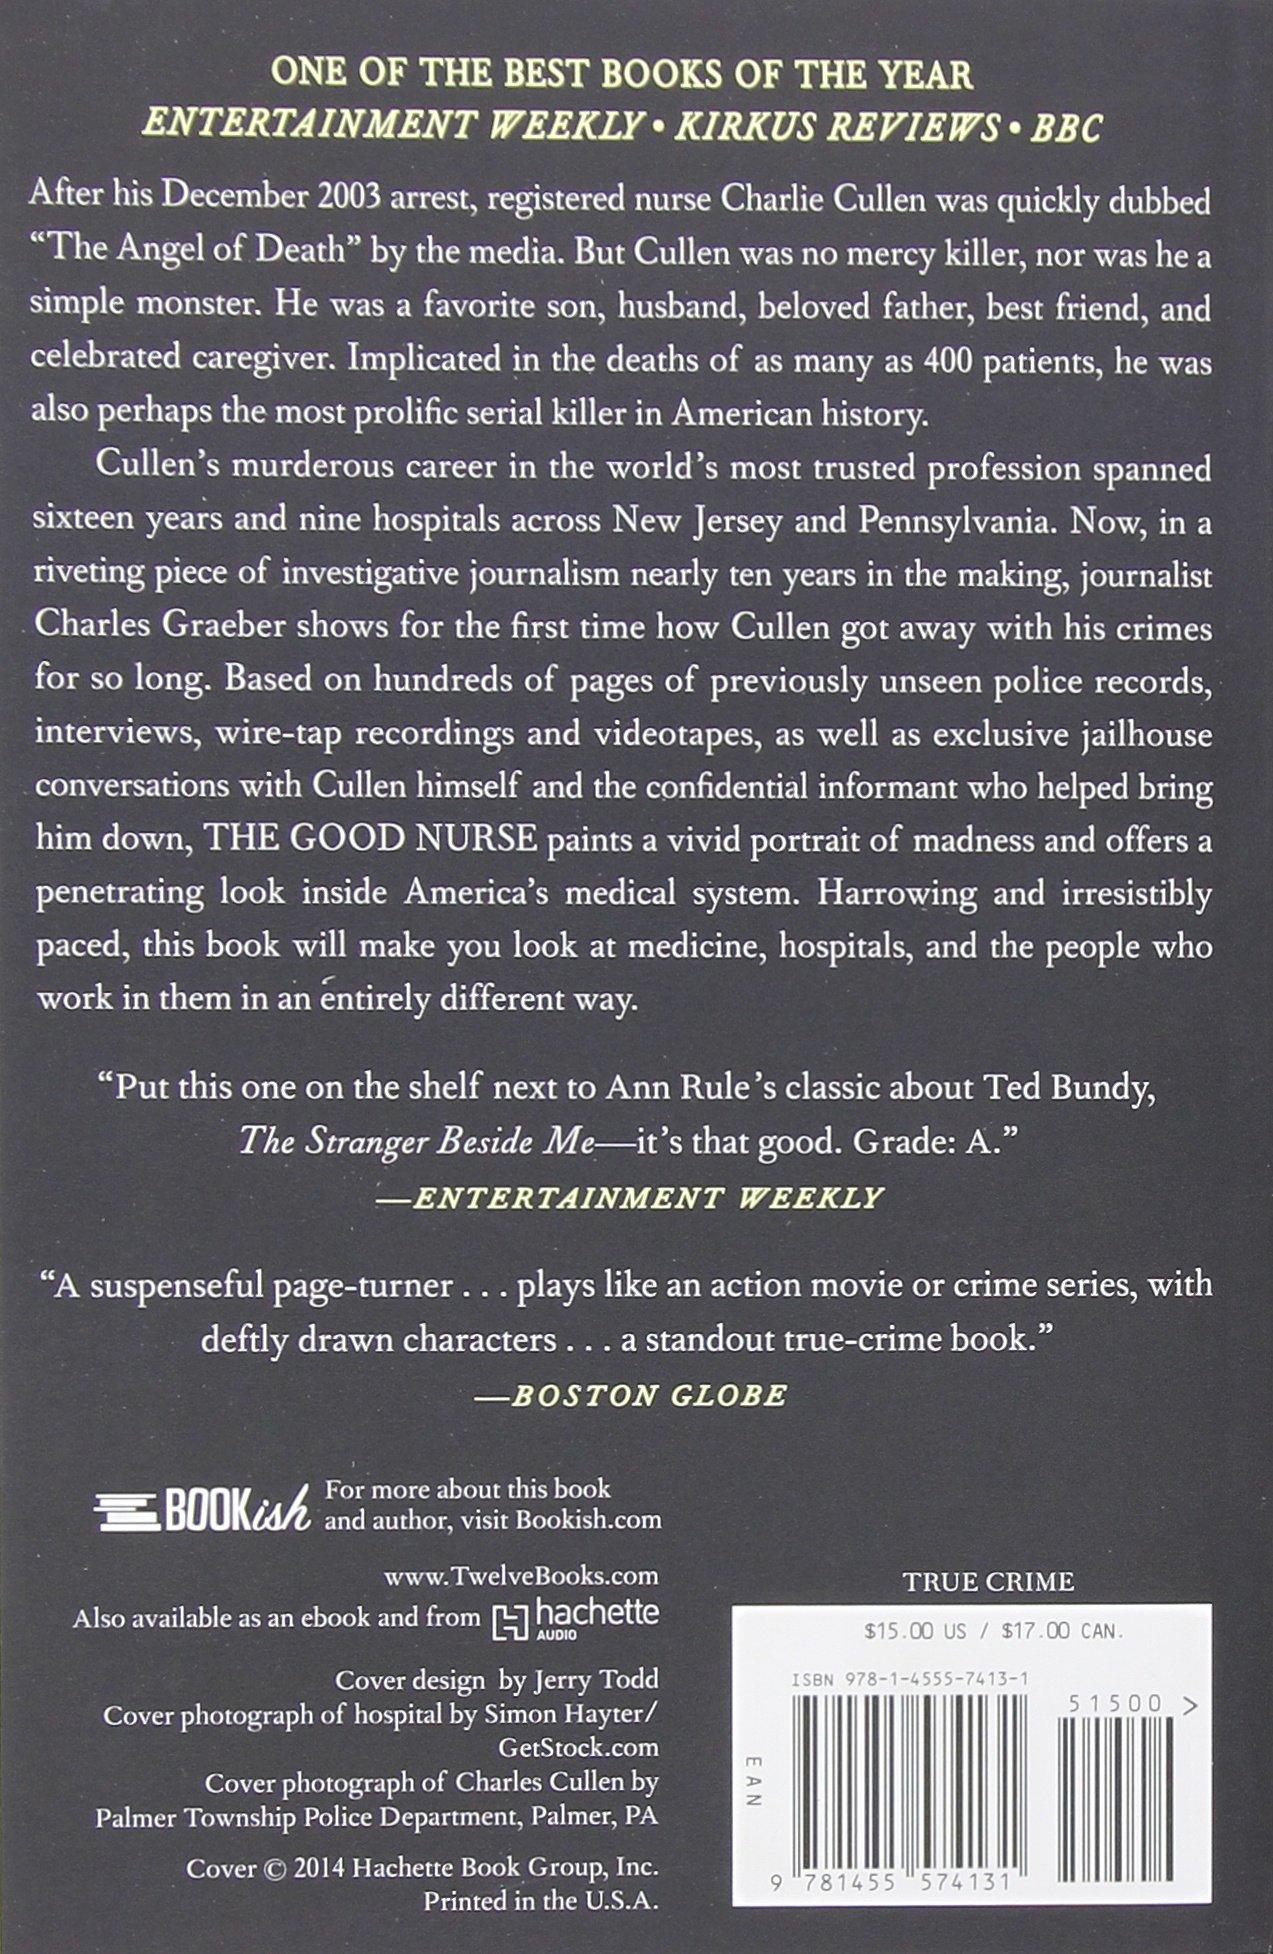 The Good Nurse: A True Story of Medicine, Madness, and Murder ...